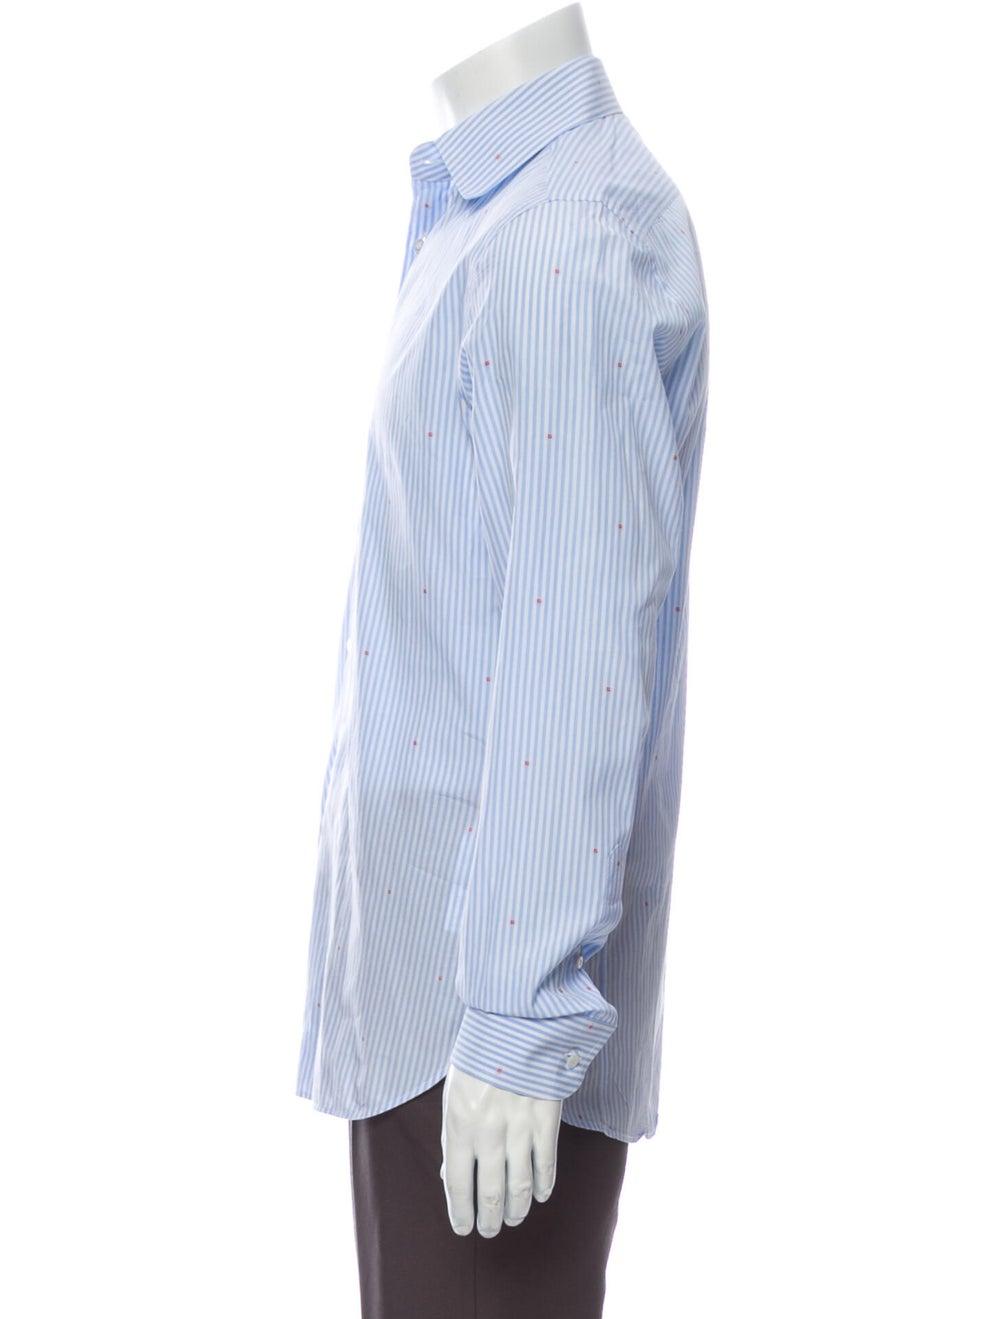 Gucci 2018 Striped Shirt Blue - image 2